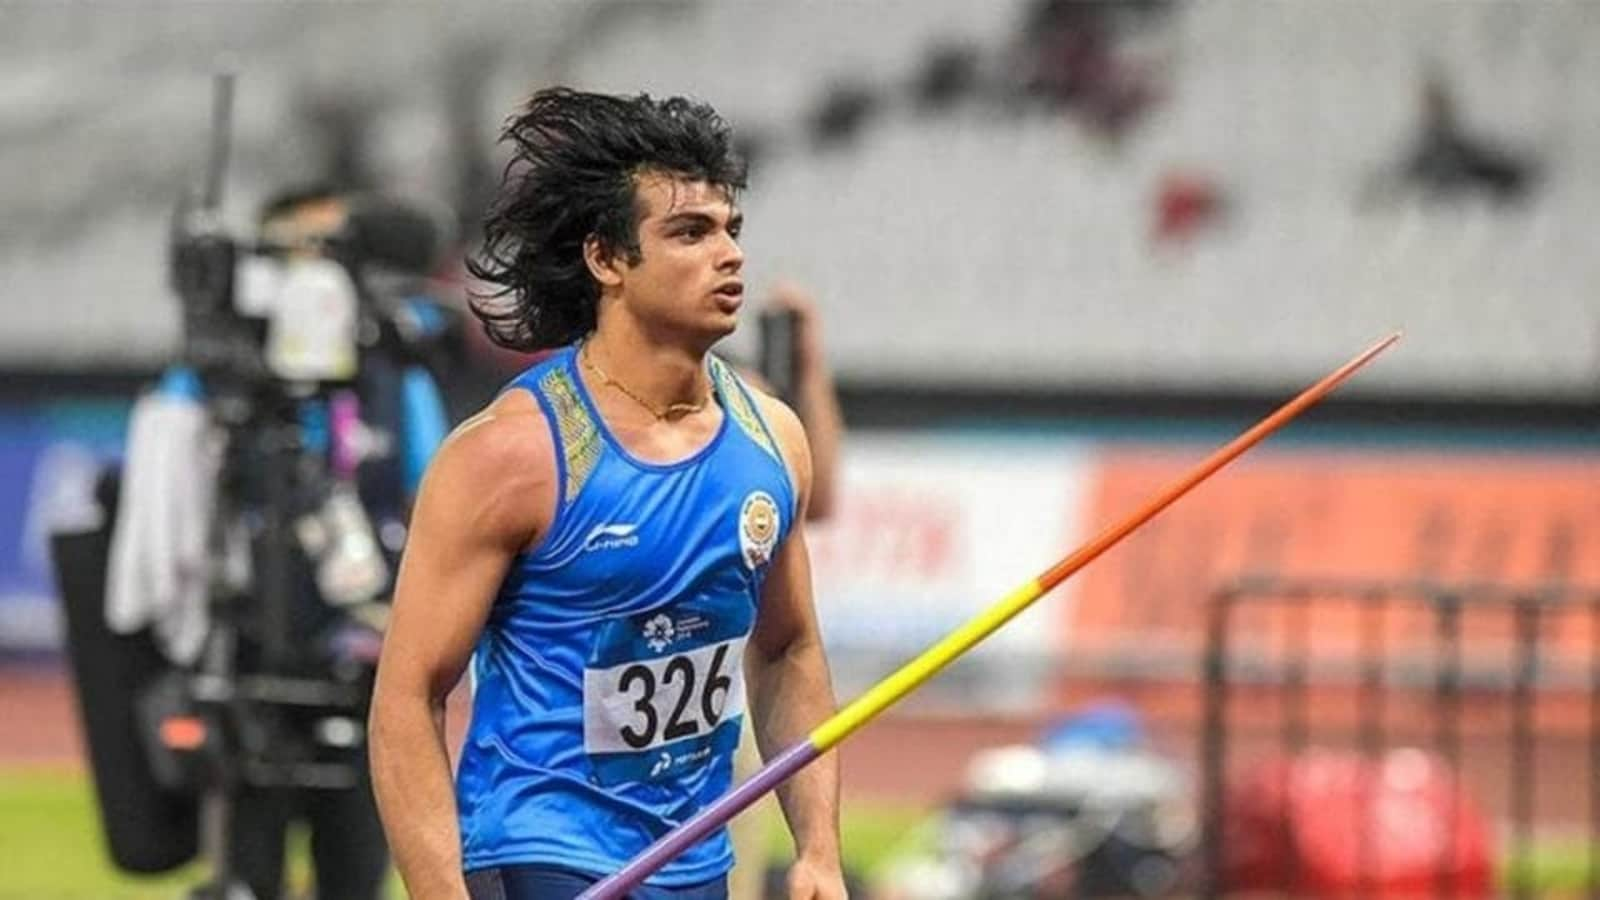 Olympics: Former world javelin throw champion Vetter says 'it will be  tough' for Neeraj Chopra to beat him | Olympics - Hindustan Times